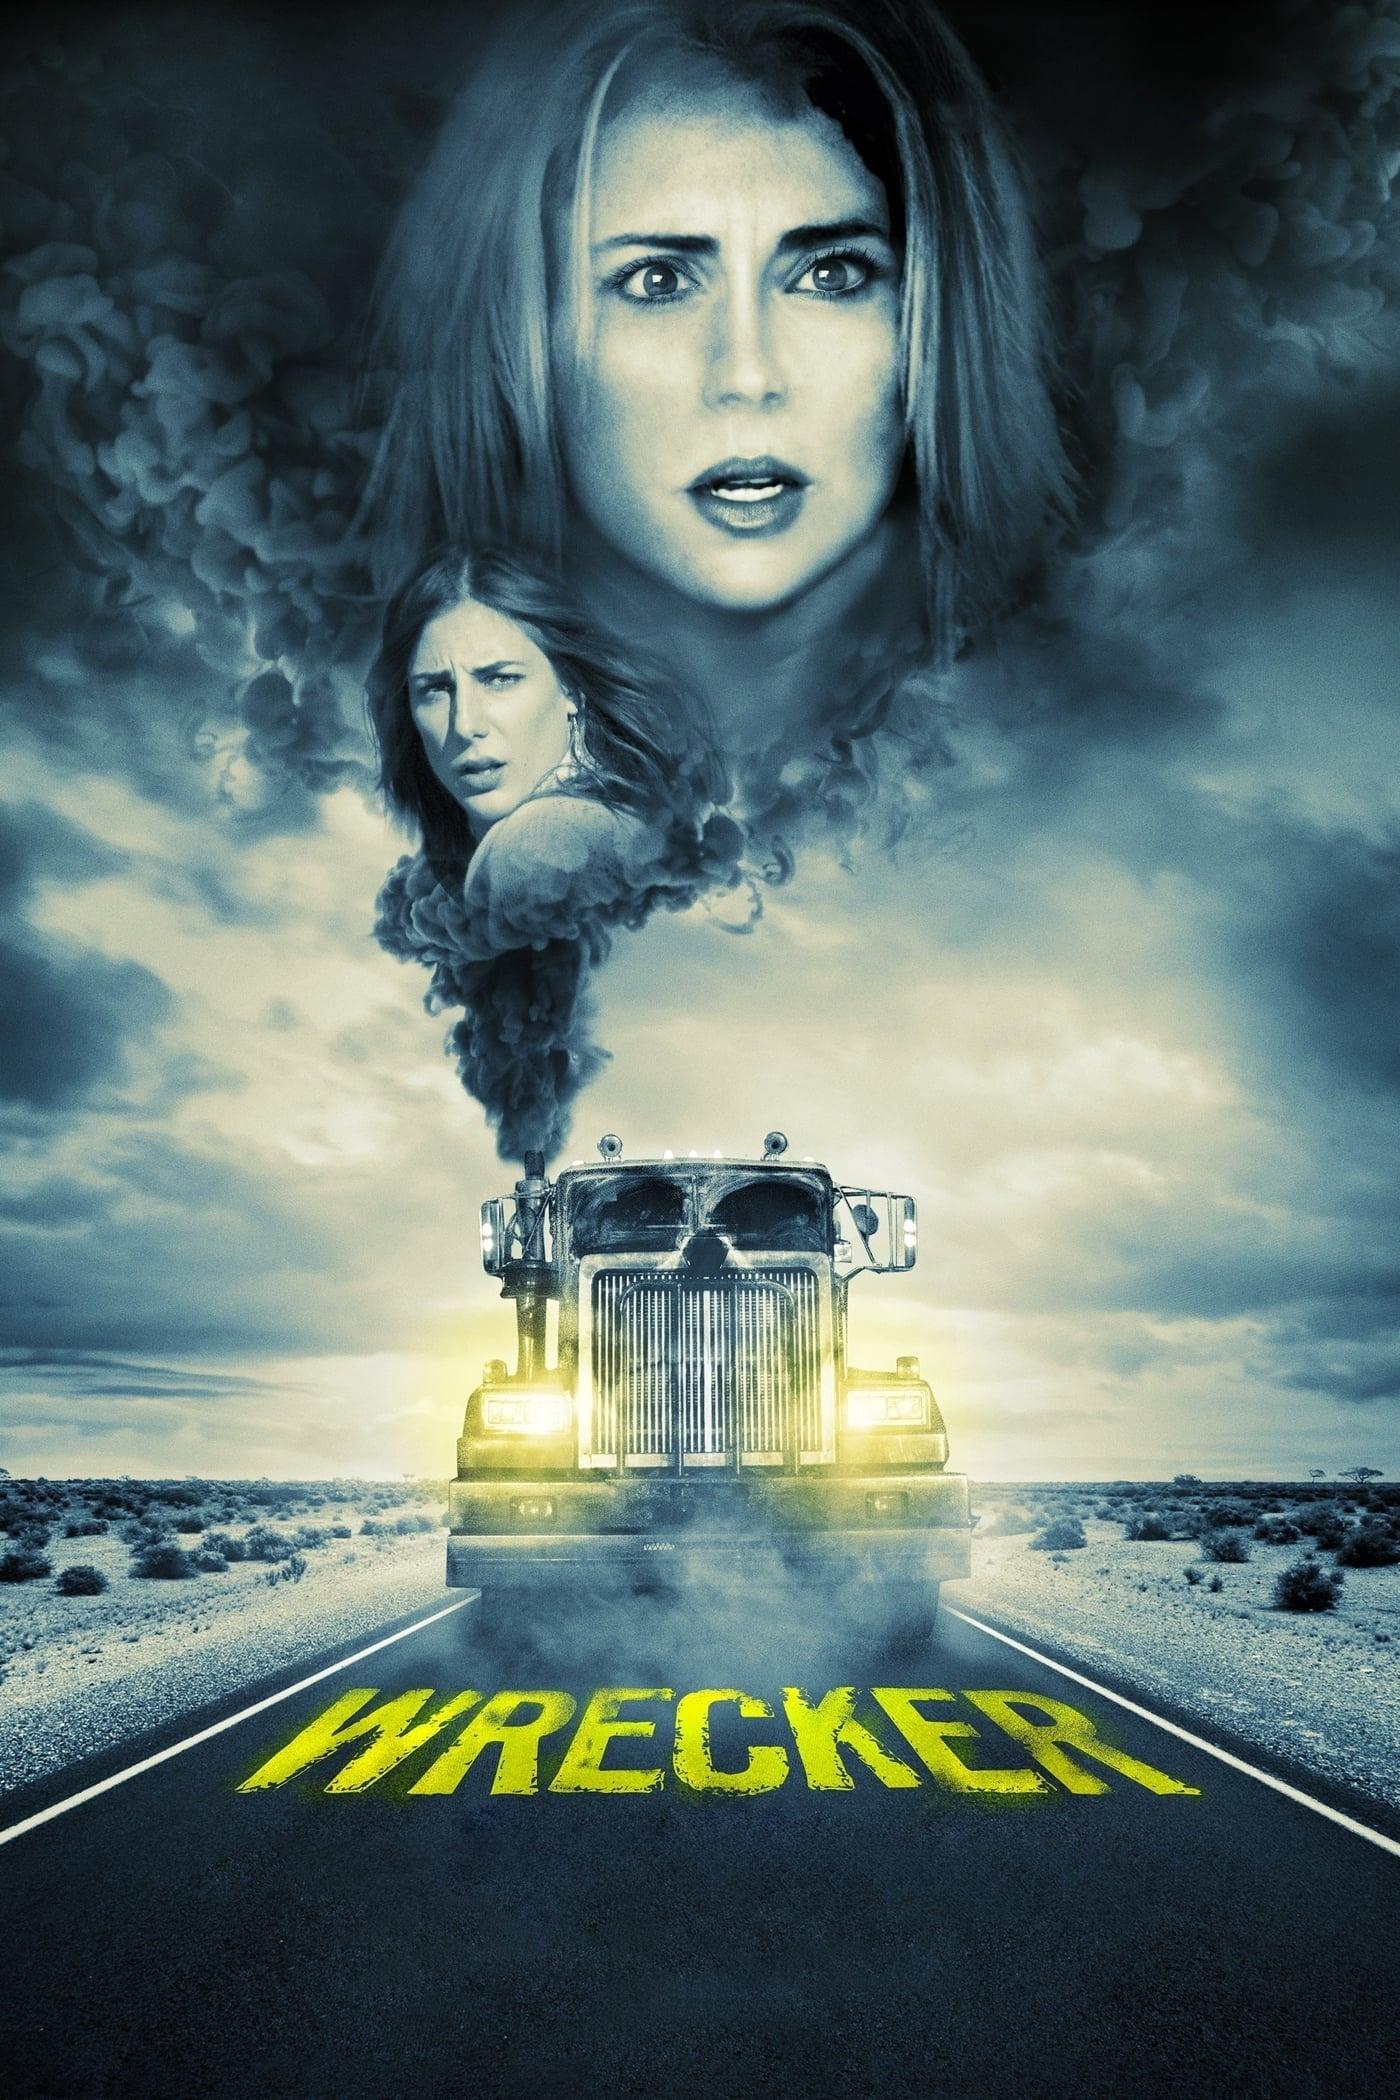 Duelo en el asfalto (Wrecker)